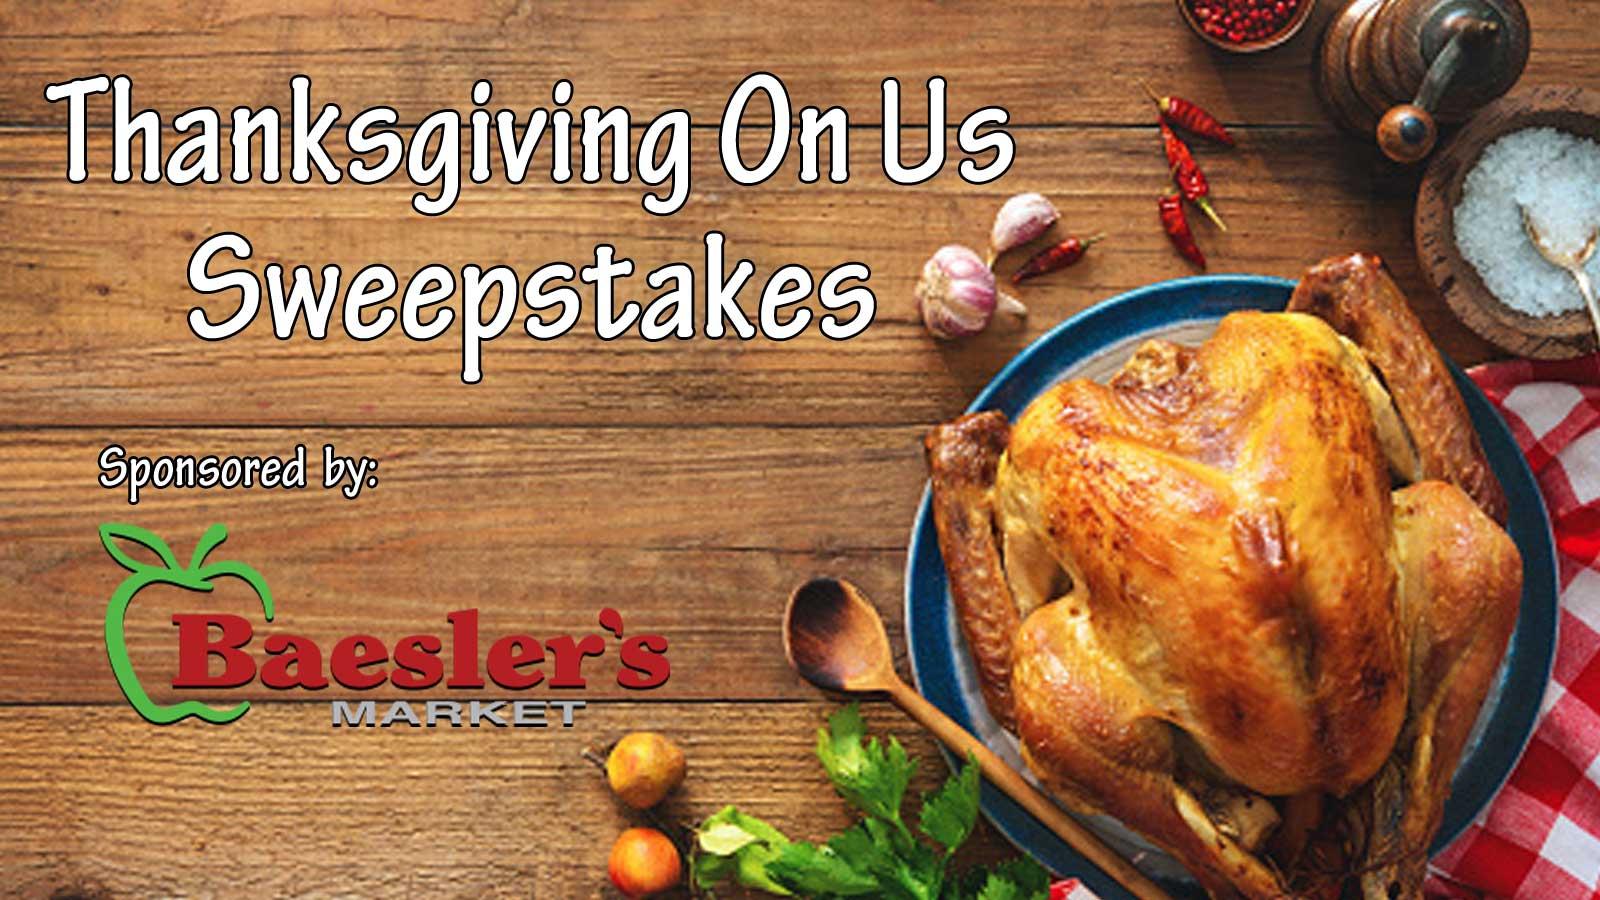 Thanksgiving On US 16x9_1539223456829.jpg.jpg